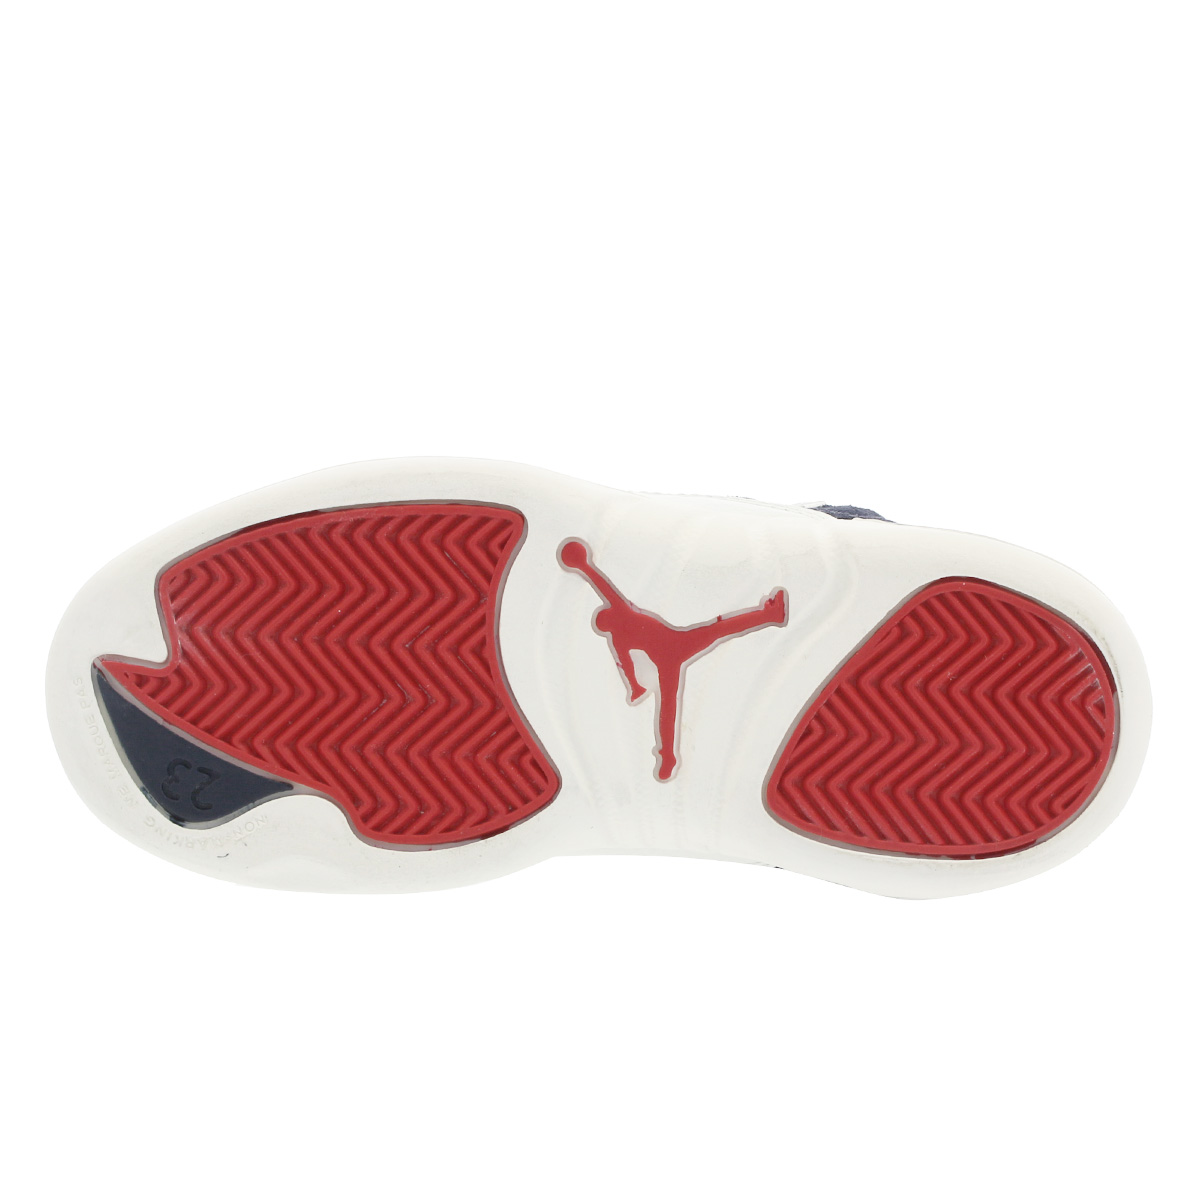 d9c374367dcd NIKE AIR JORDAN 12 RETRO PS Nike Air Jordan 12 nostalgic PS COLLEGE NAVY  SAIL UNIVERSITY RED bv8018-445